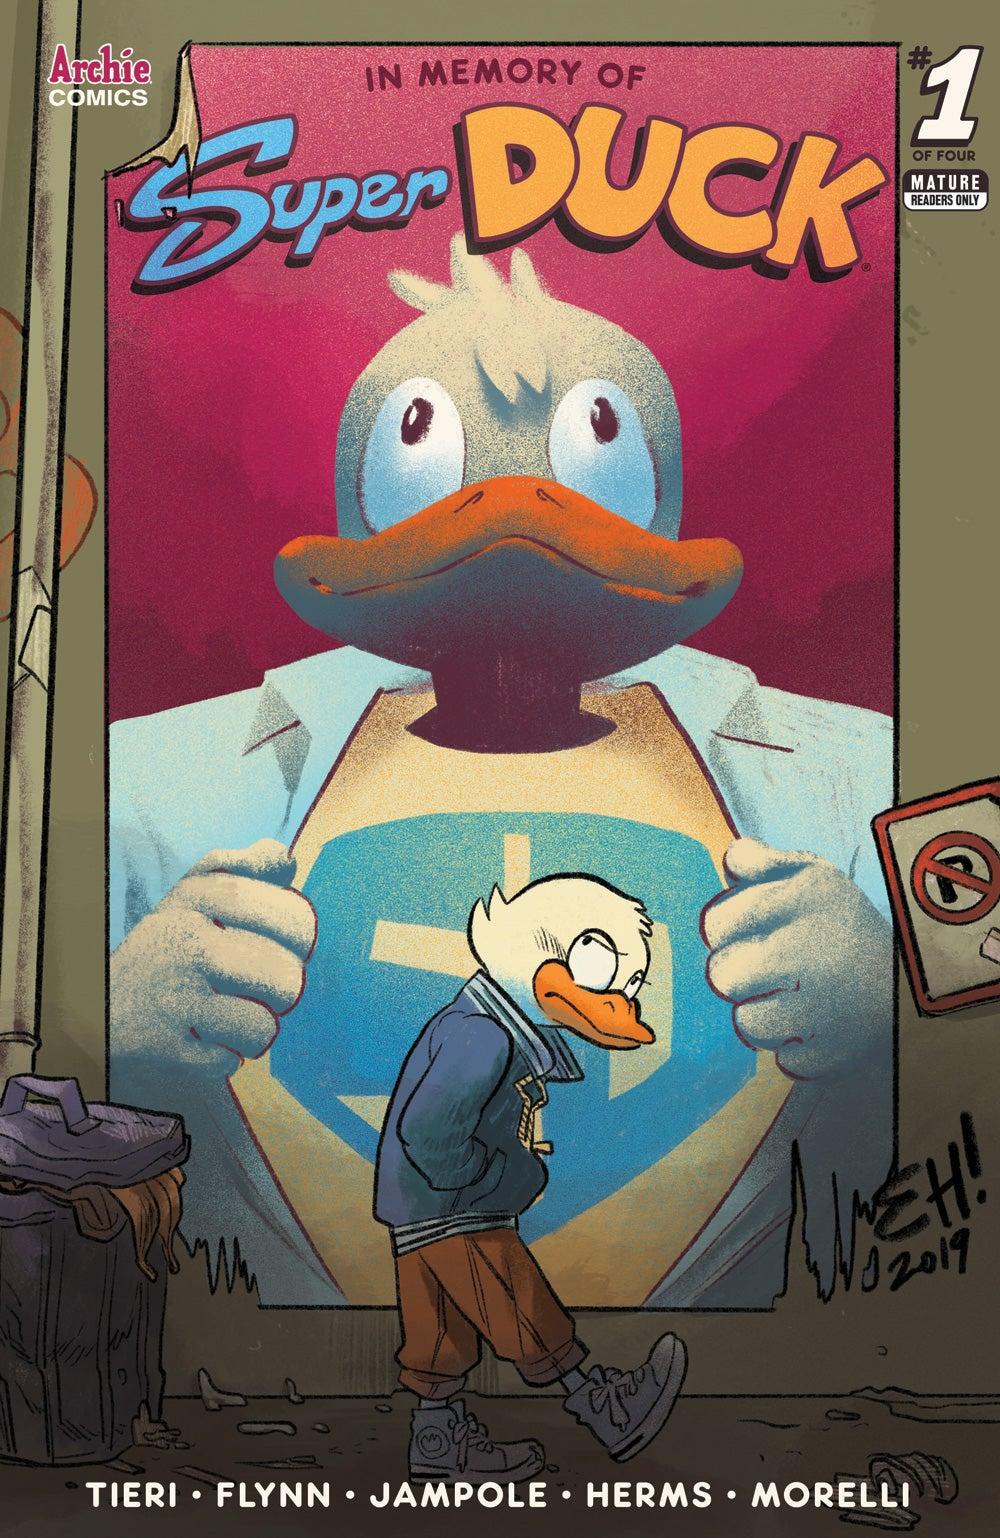 Image: Erica Henderson, Archie Comics